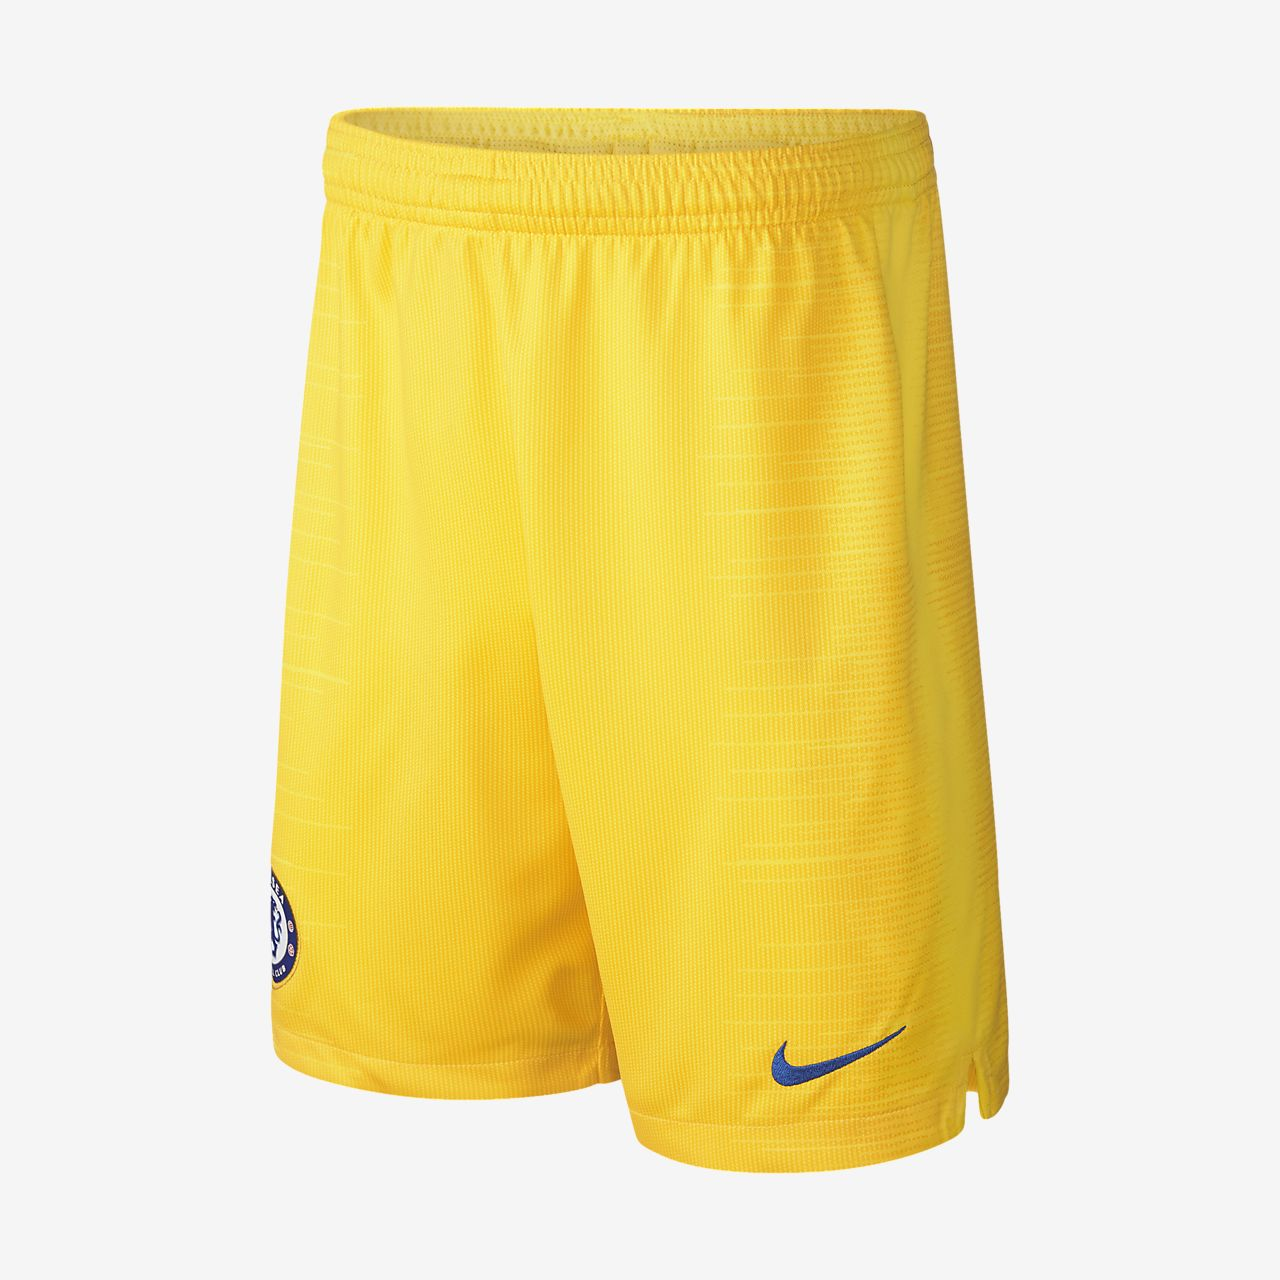 2018/19 Chelsea FC Stadium Home/Away Older Kids' Football Shorts